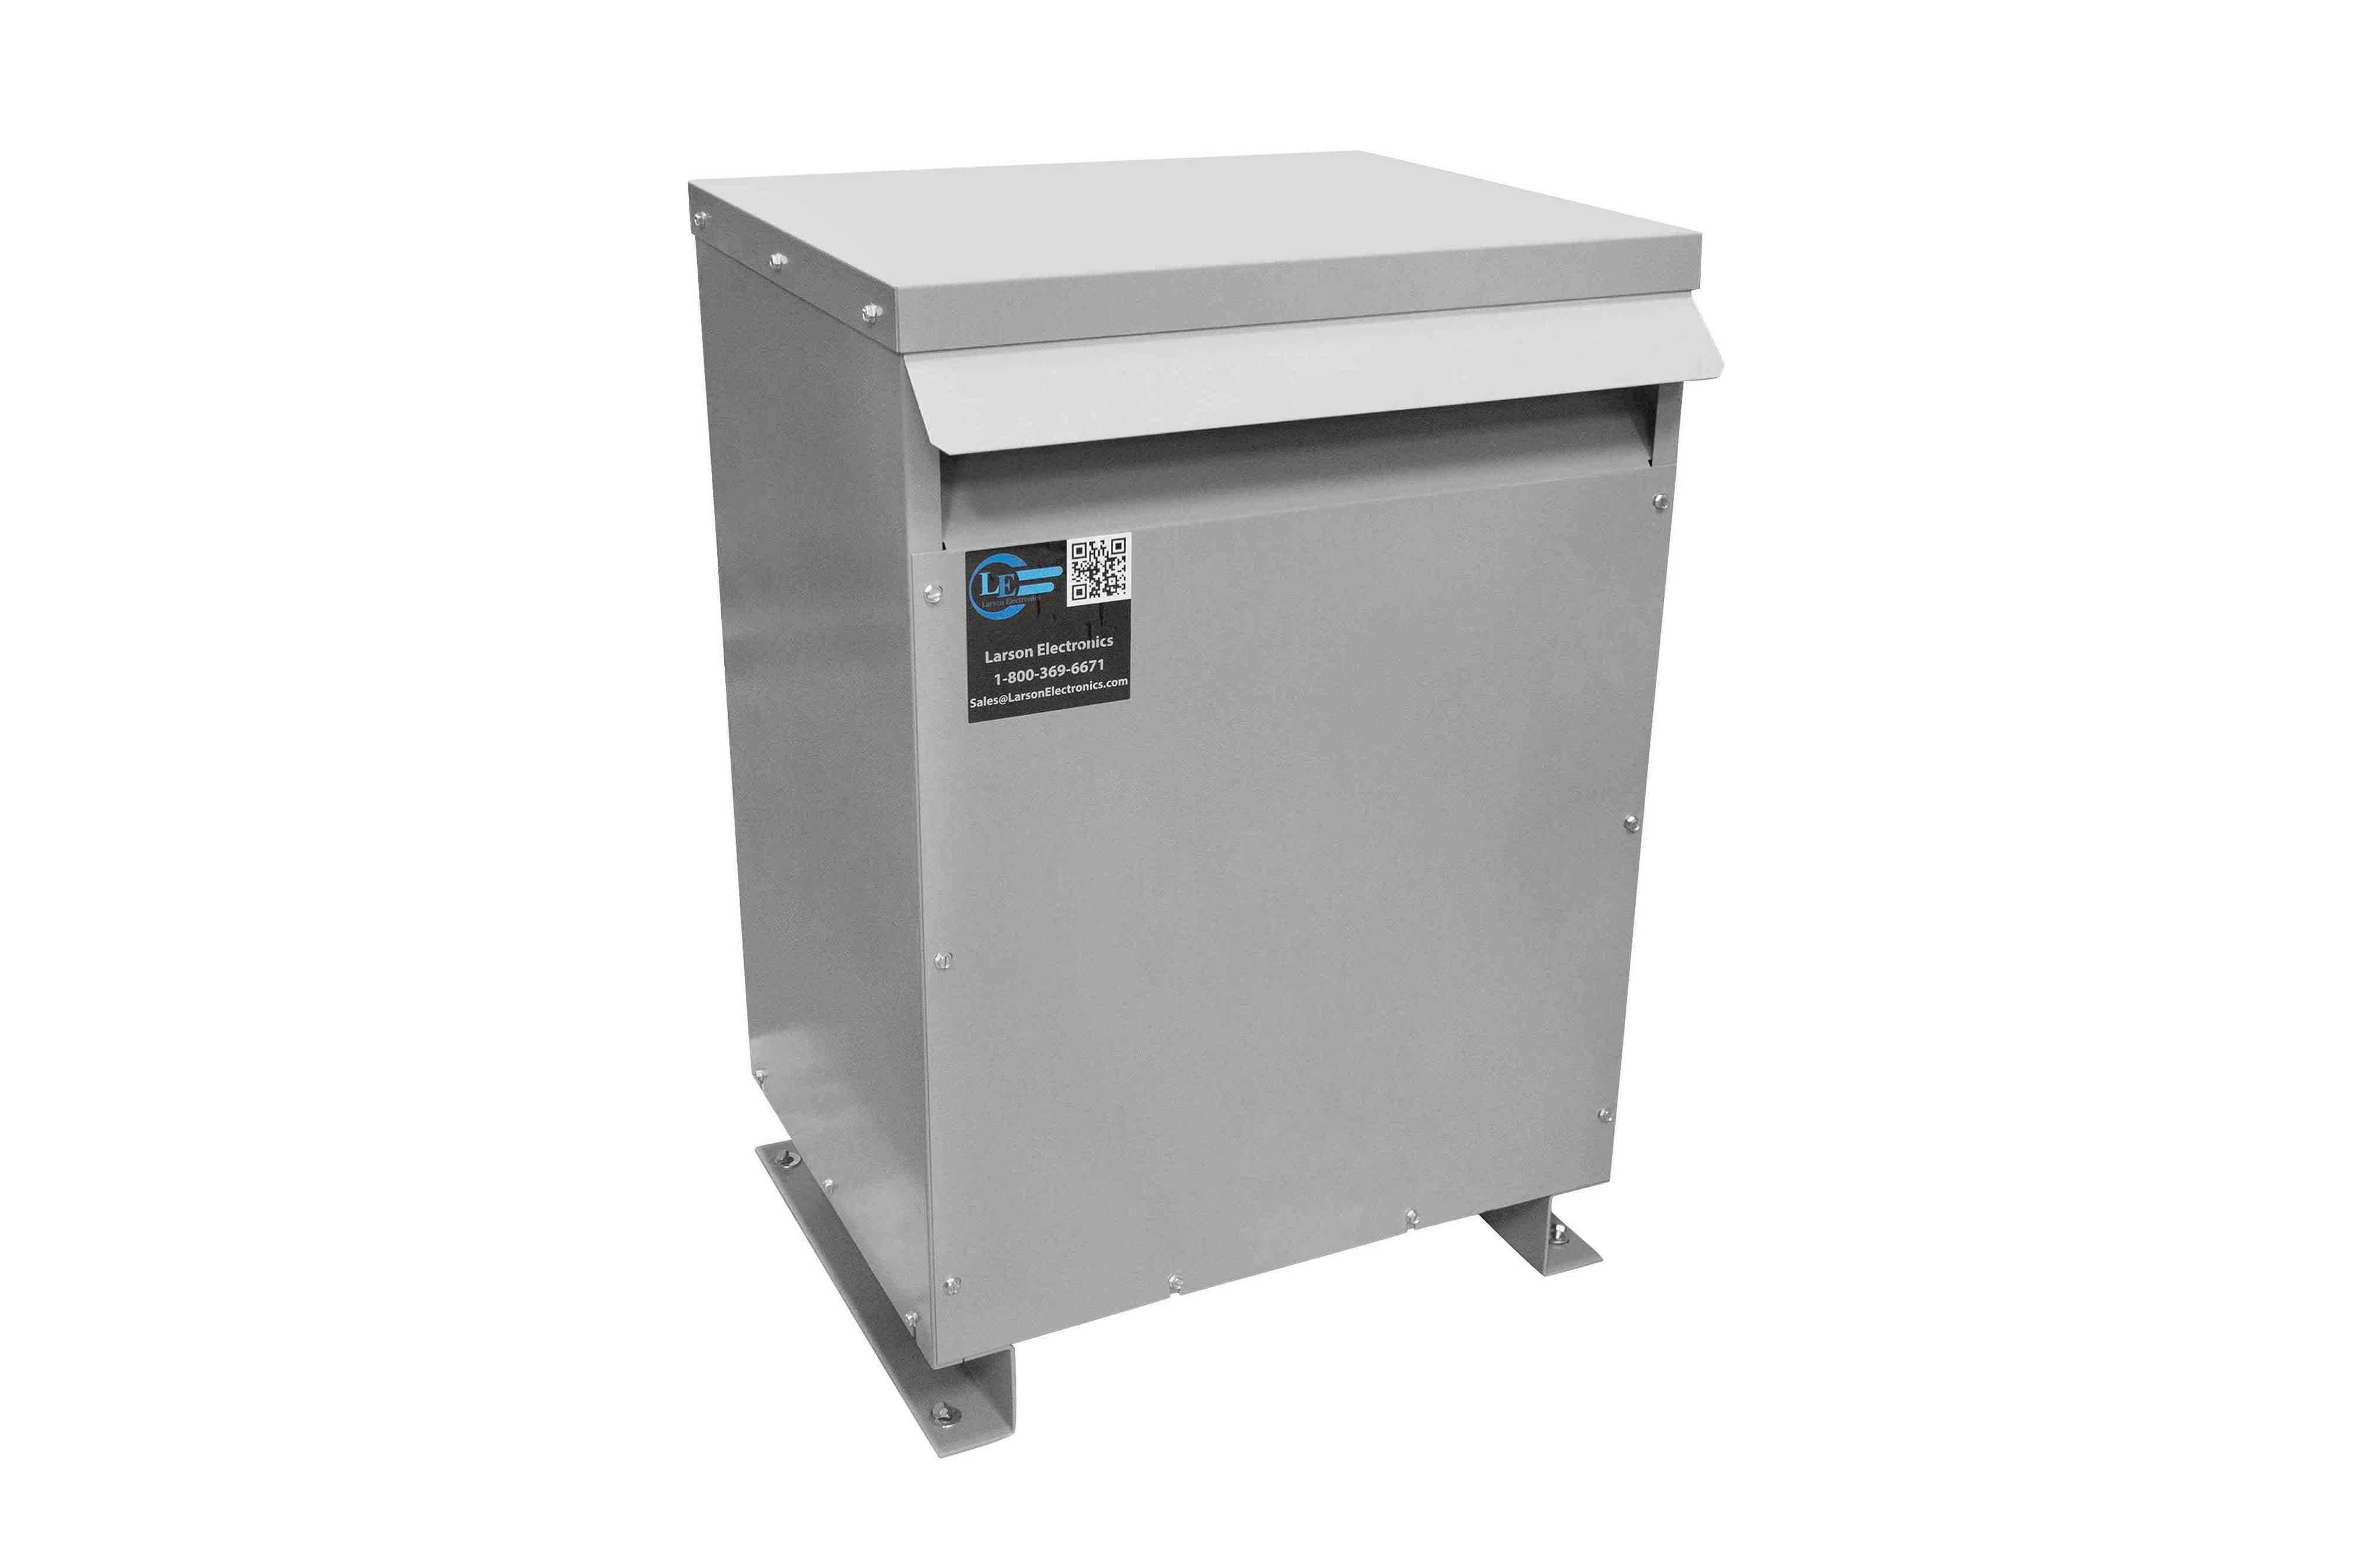 18 kVA 3PH Isolation Transformer, 600V Wye Primary, 480V Delta Secondary, N3R, Ventilated, 60 Hz